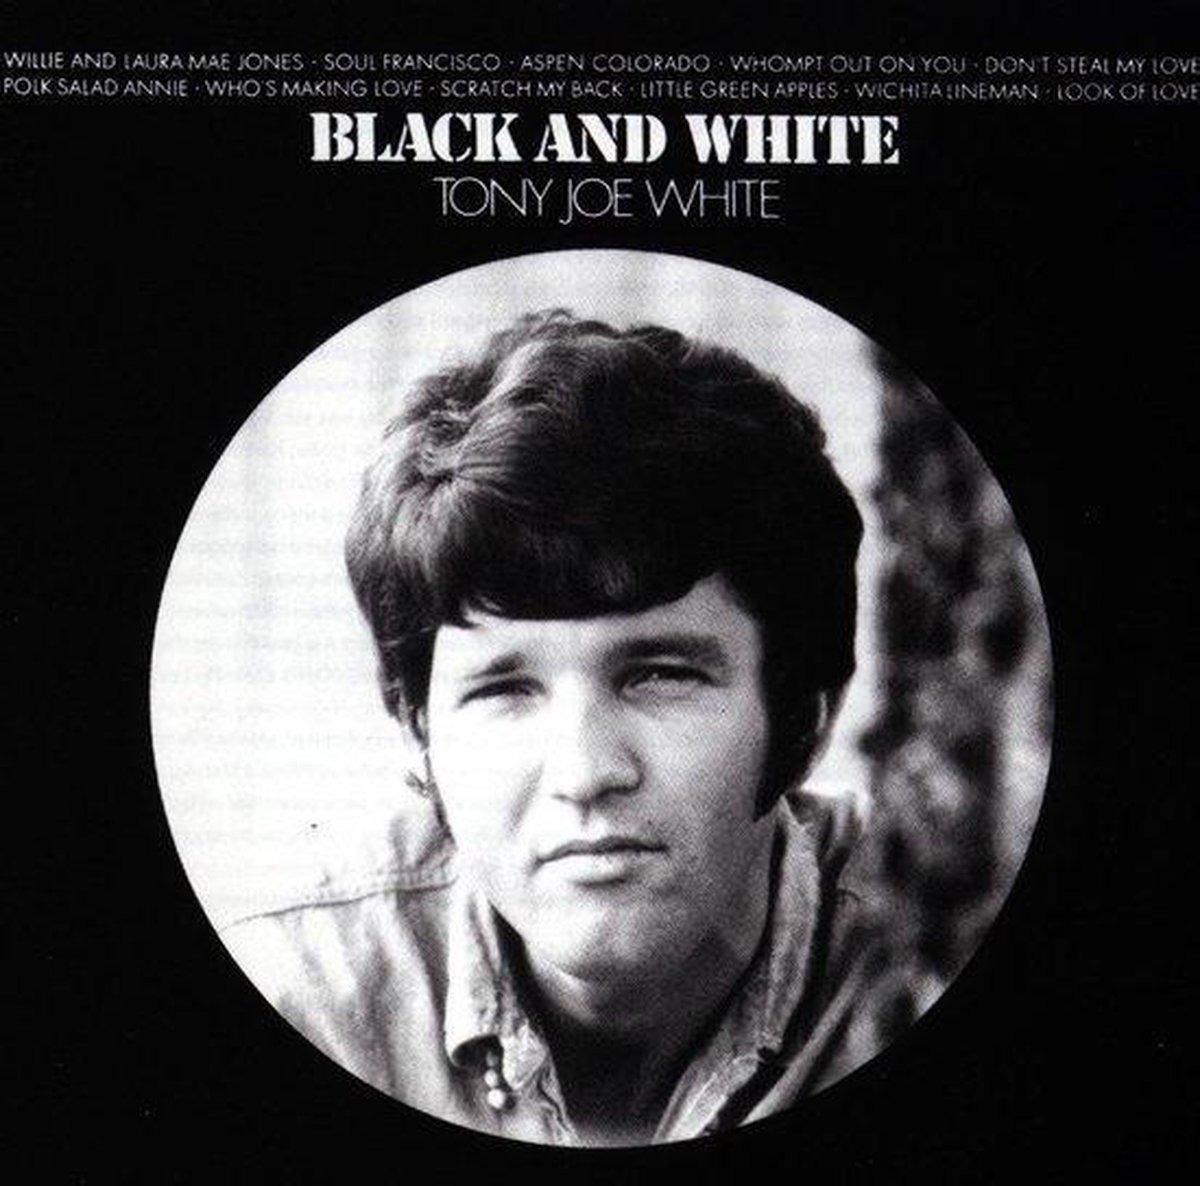 Black And White - Tony Joe White - Musik - ANALOGUE PRODUCTIONS - 0753088129315 - February 19, 2021